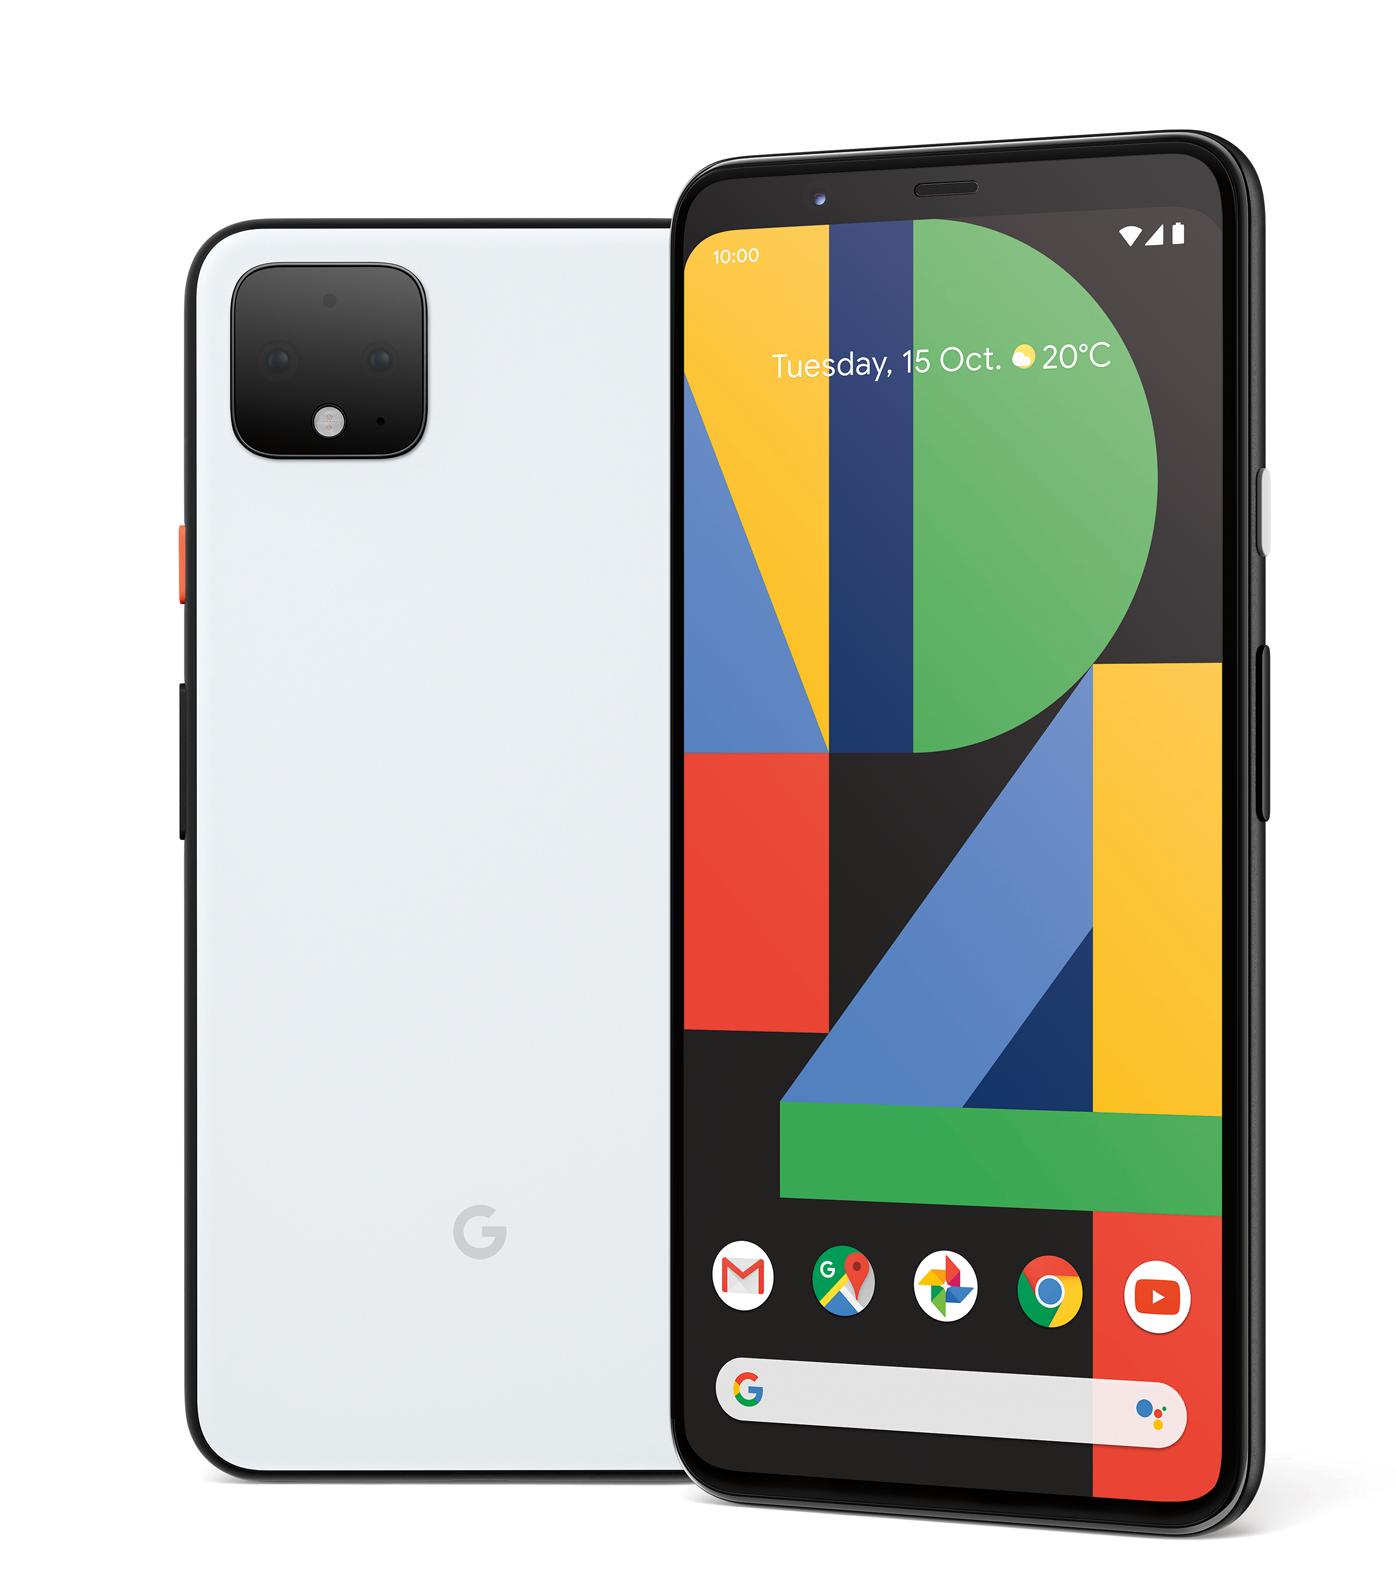 Google delivers new smartphone